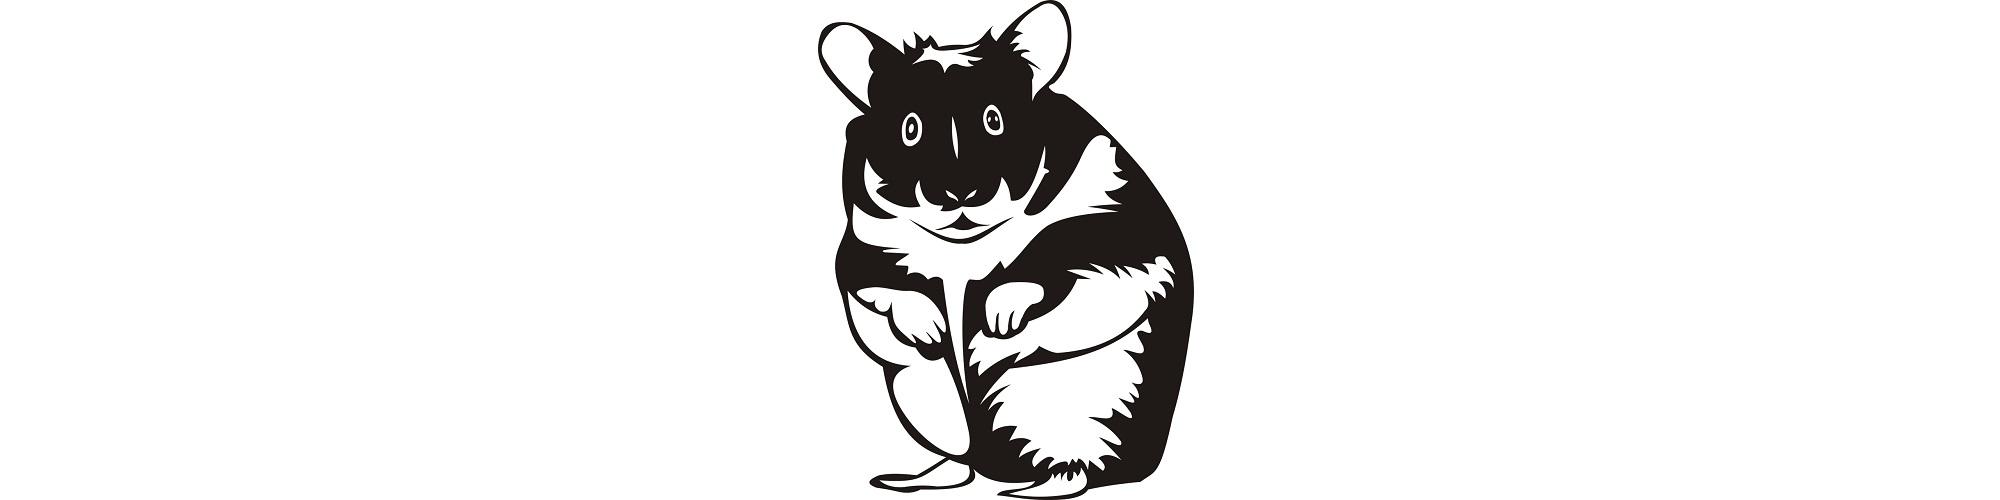 "Hamster clipart - ""Silly Hammy"" microfiction"